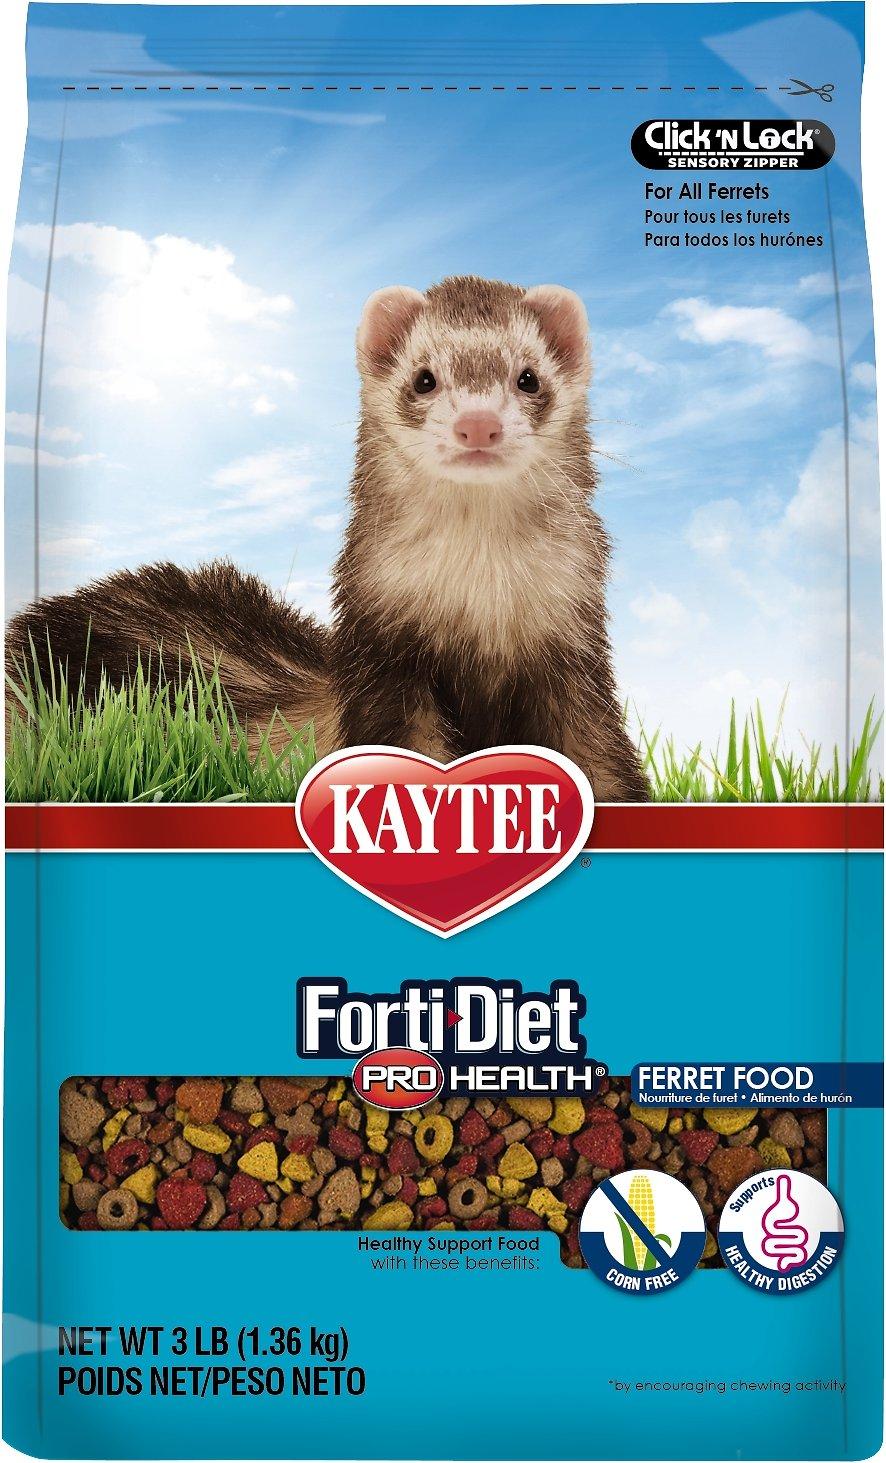 Kaytee Forti-Diet Pro Health Ferret Food, 3-lb bag